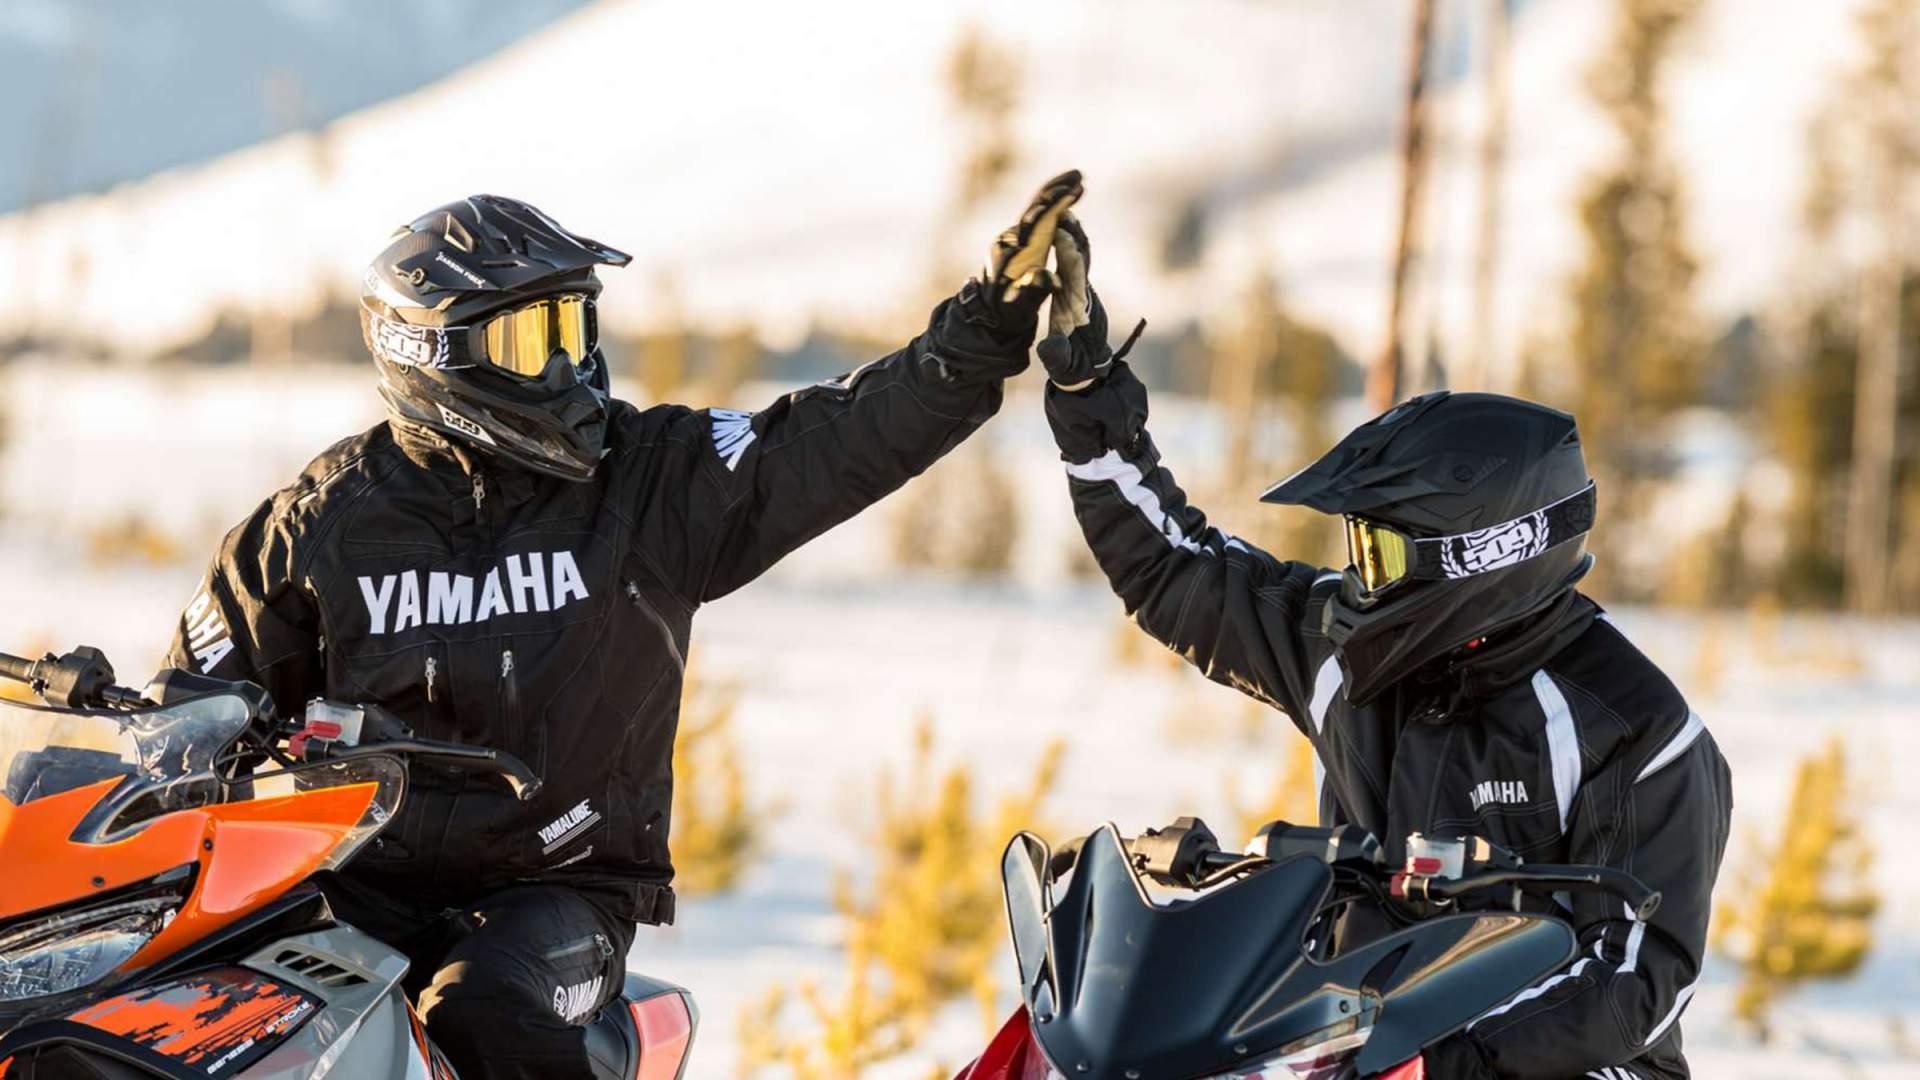 Yamaha Adventures snowmobilers doing a high five at Horseshoe Resort